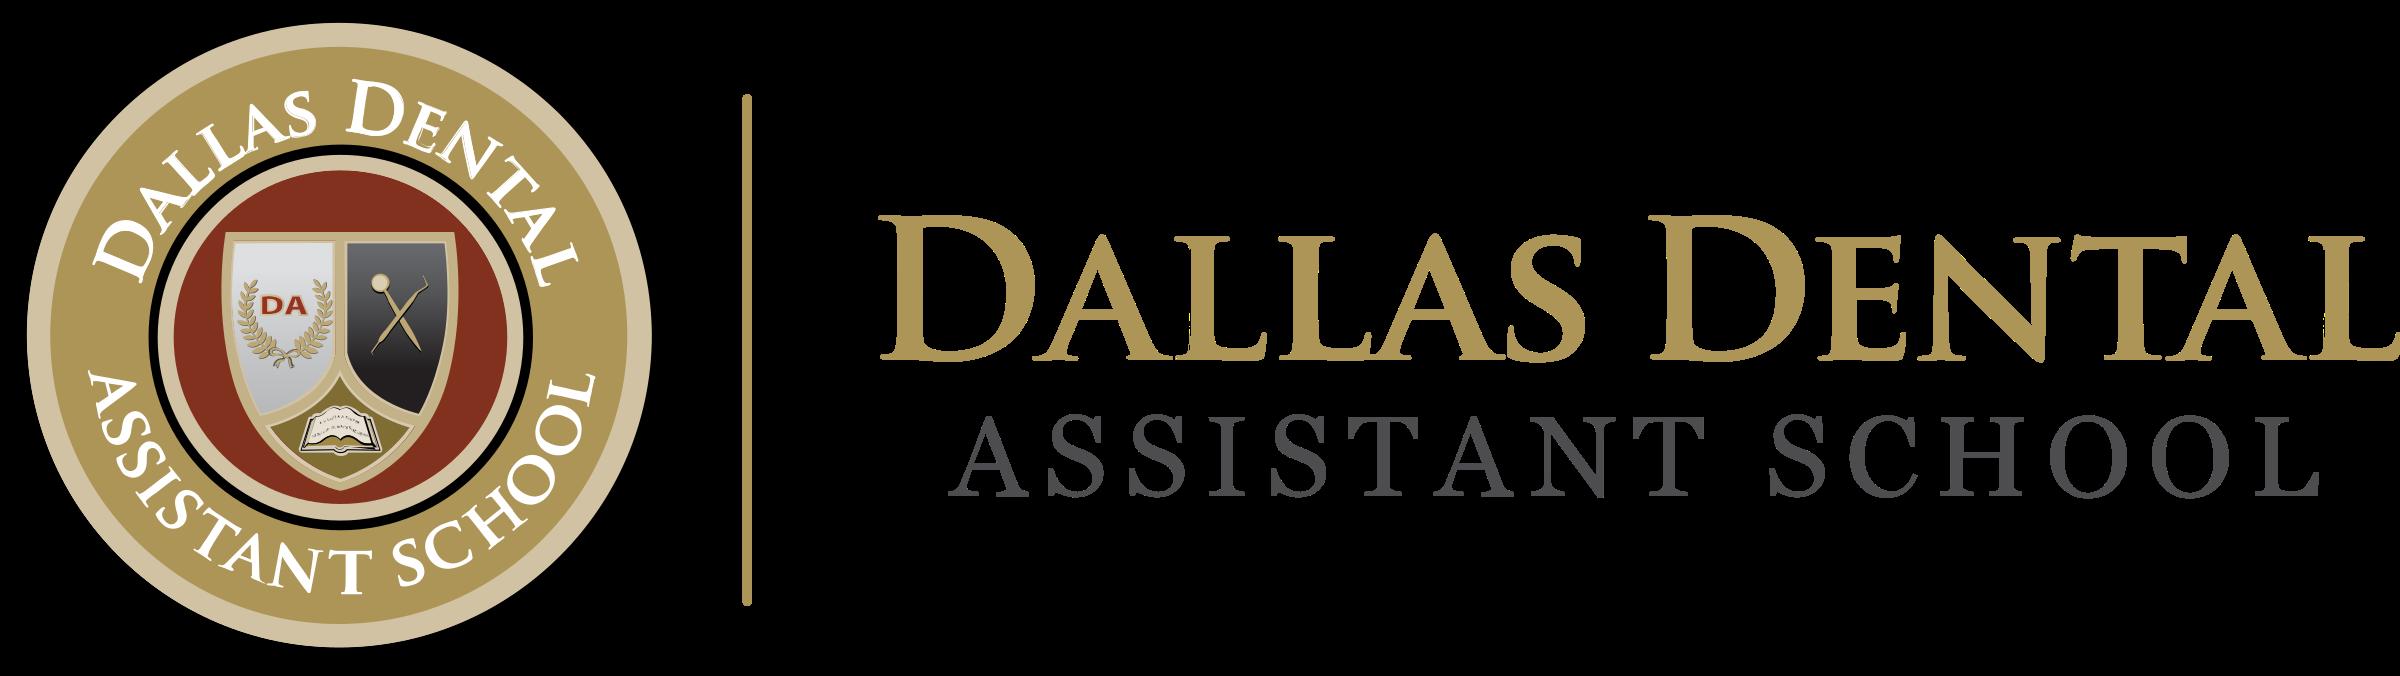 jpg transparent stock Dallas school logo png. Vector dental assistant